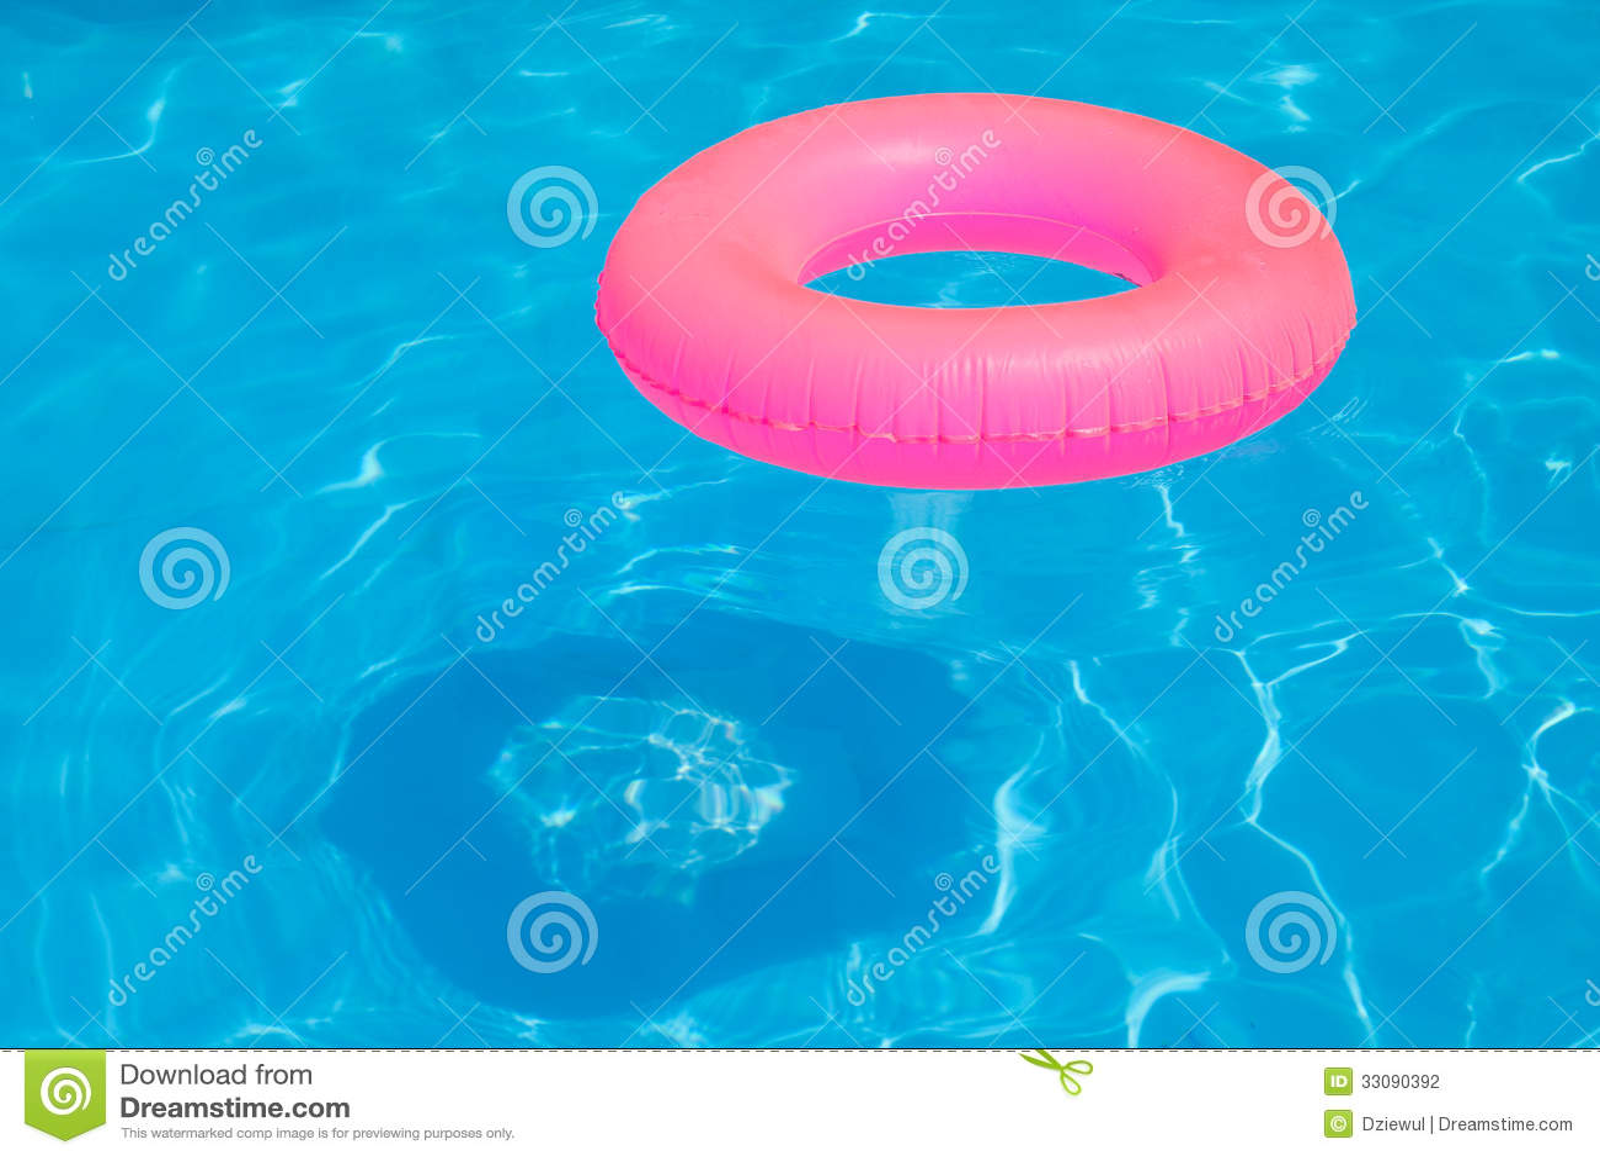 Pink Pool Float Pool Ring In Cool Blue Refreshing Blue Pool